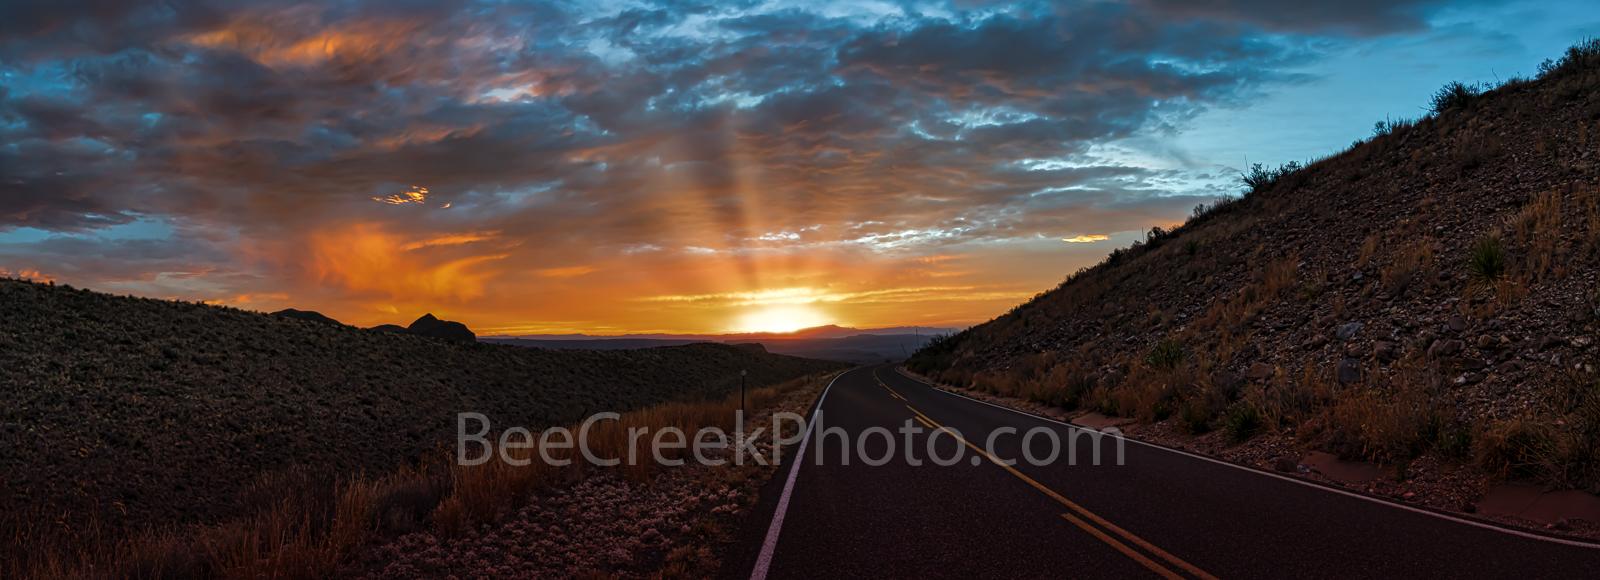 Sunset, Ross Maxwell Scenic Drive, Big Bend National Park, pano, panorama, panoramic, texas landscape, suns rays, road,Santa Elena Canyon, Texas sunset, landscape,  texas landscape,  , photo